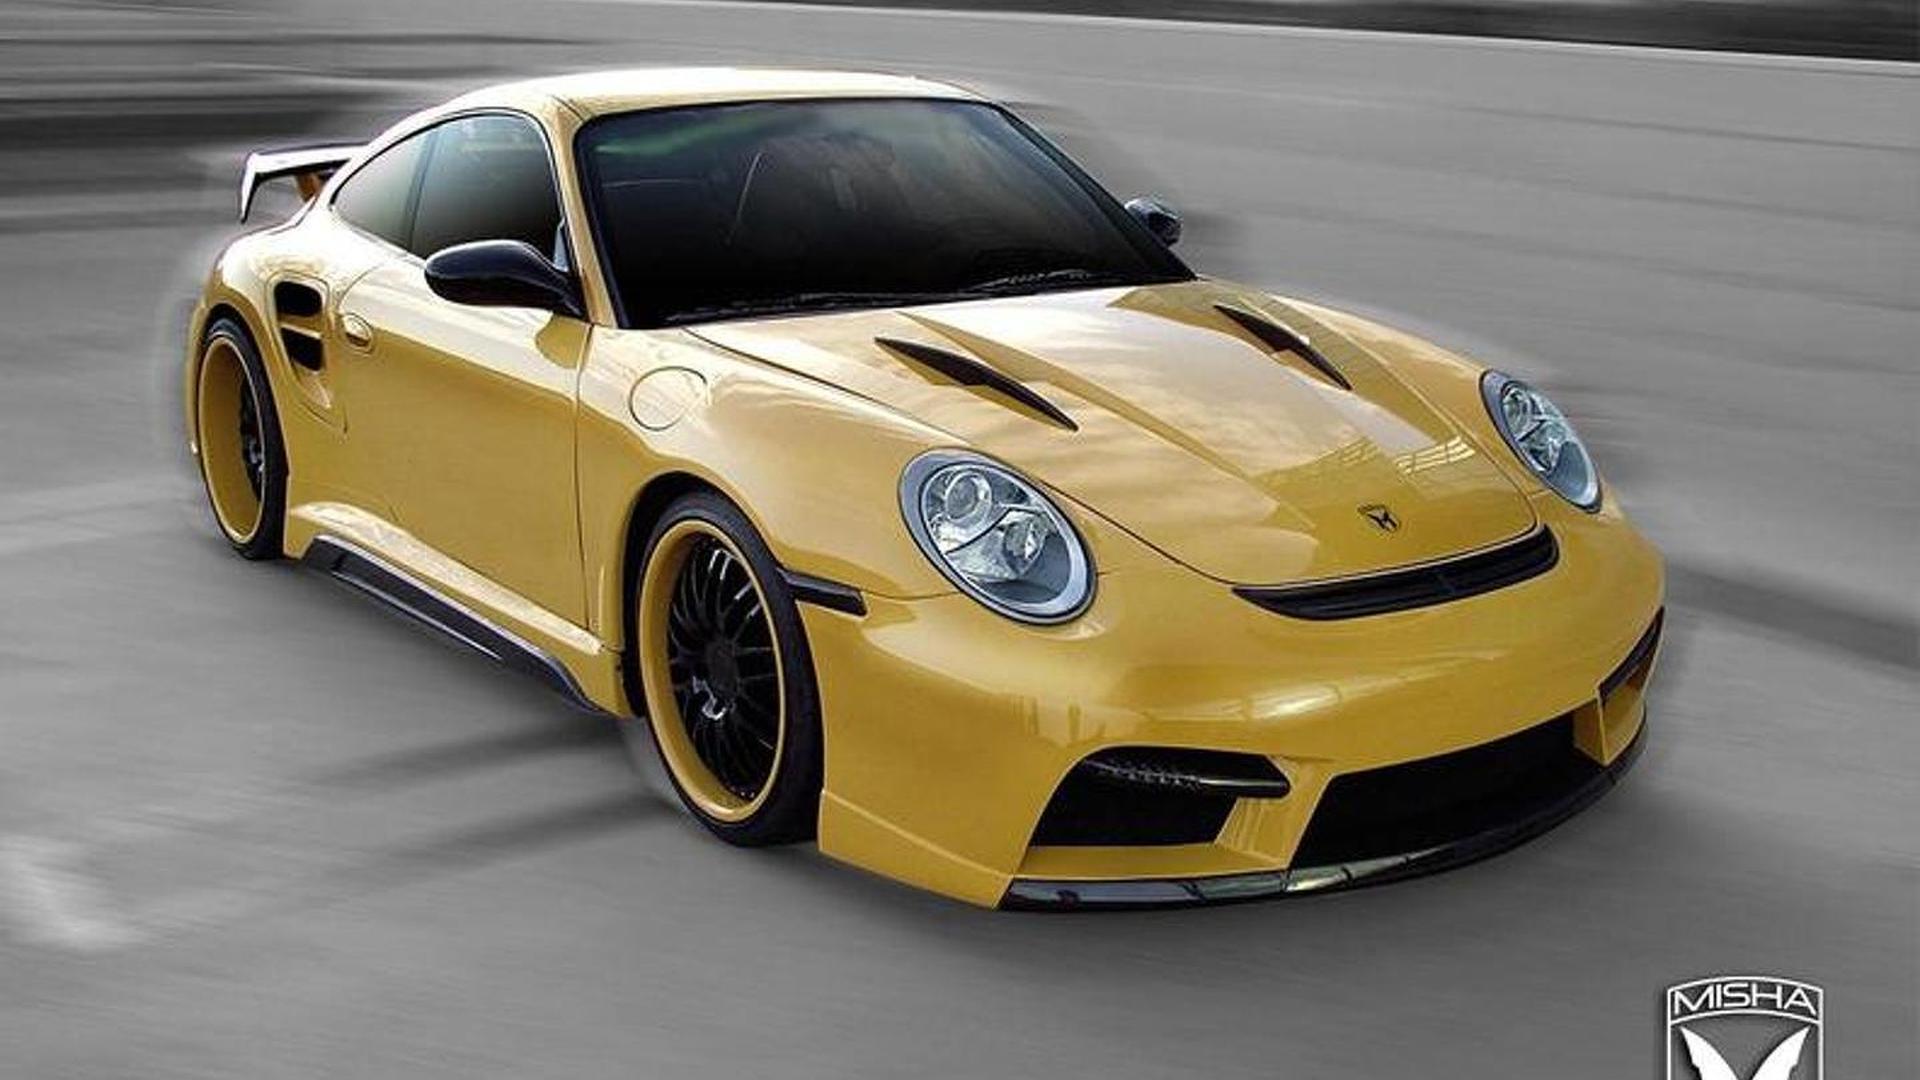 2010-207441-porsche-911-turbo-body-kit-by-misha-design-772-30-07-20101 Stunning Porsche 911 Gt2 Body Kit Cars Trend